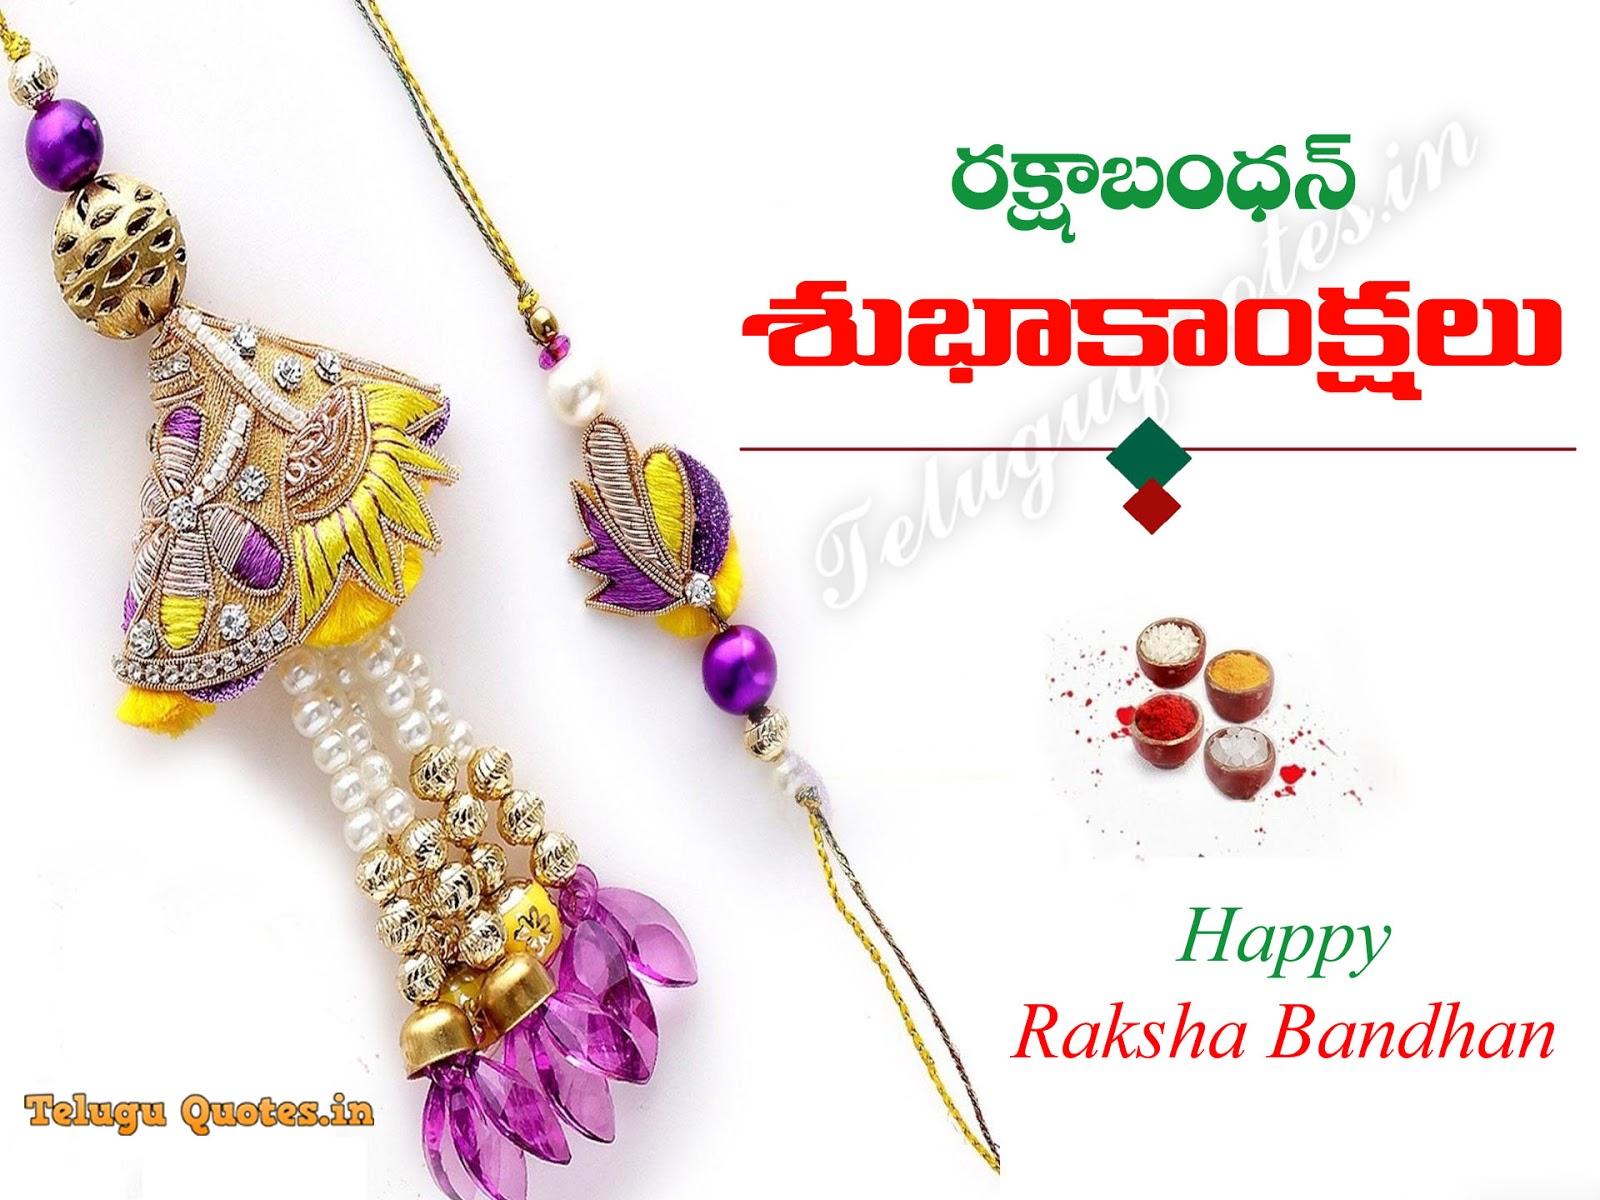 Happy Raksha Bandhan Wishes For Facebook Telugu Quotes